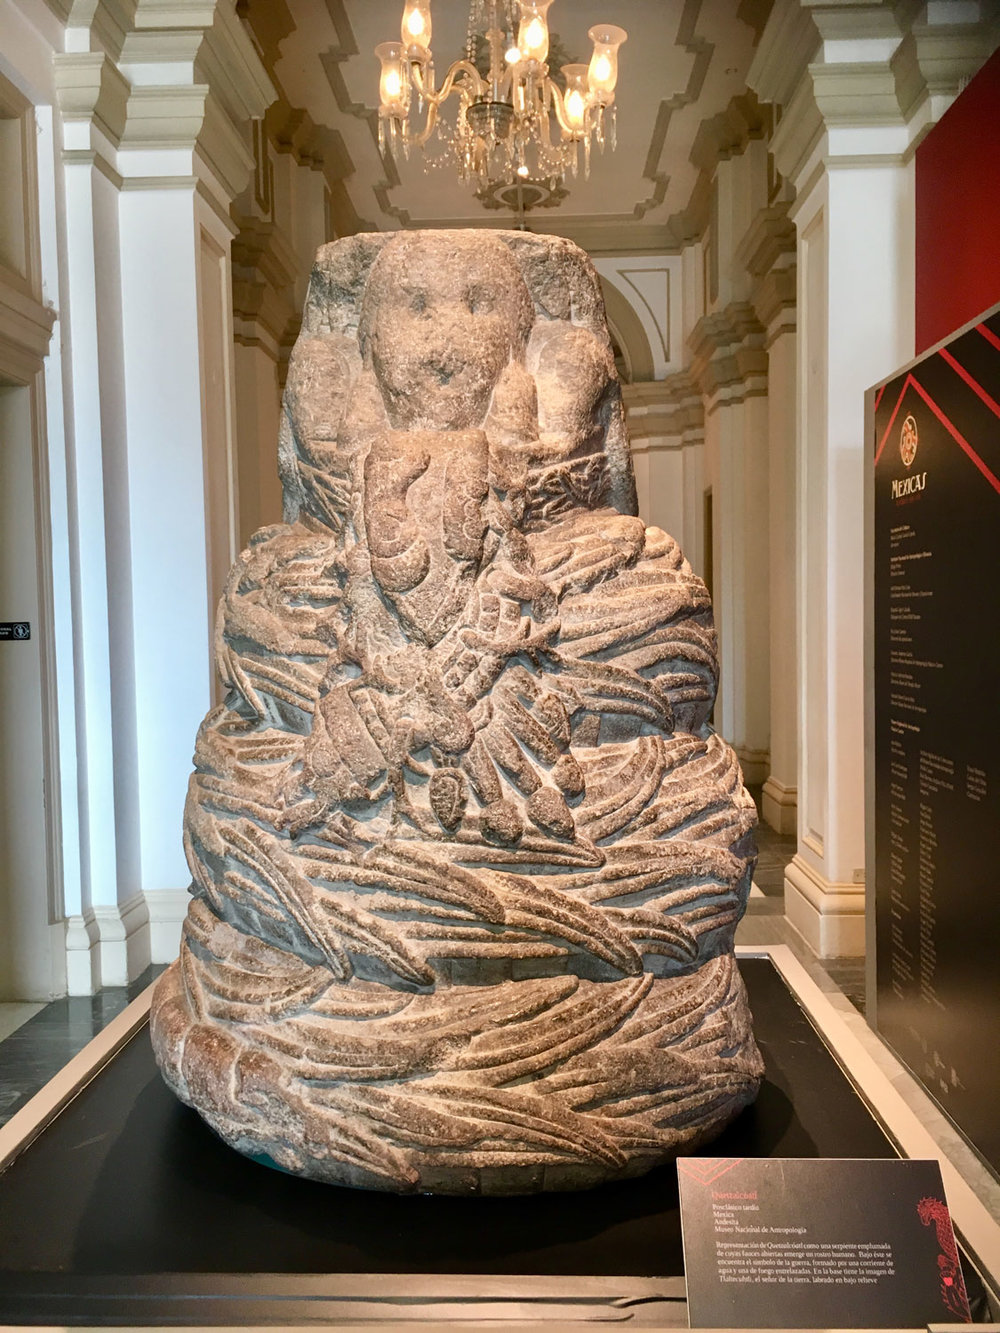 Feathered Serpent as representation of God Quetzalc ó atl.